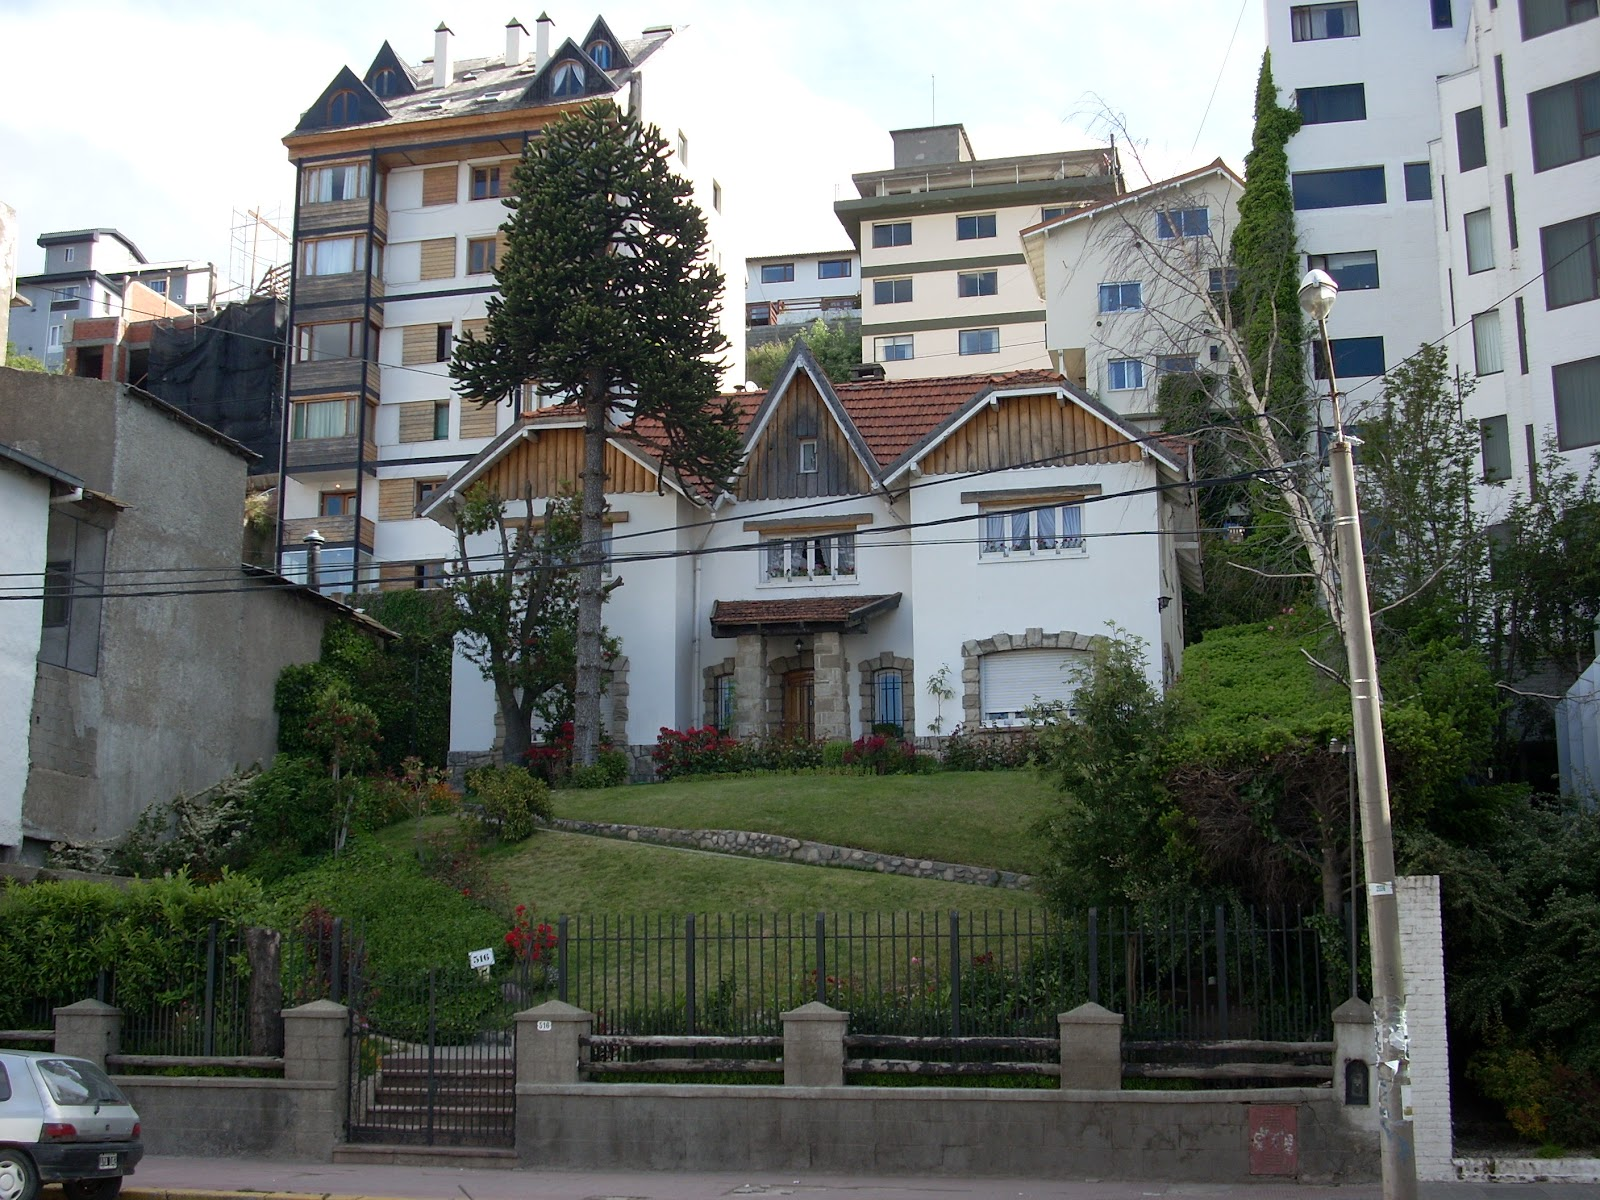 I like this house, nestled amongst the bland modern buildings